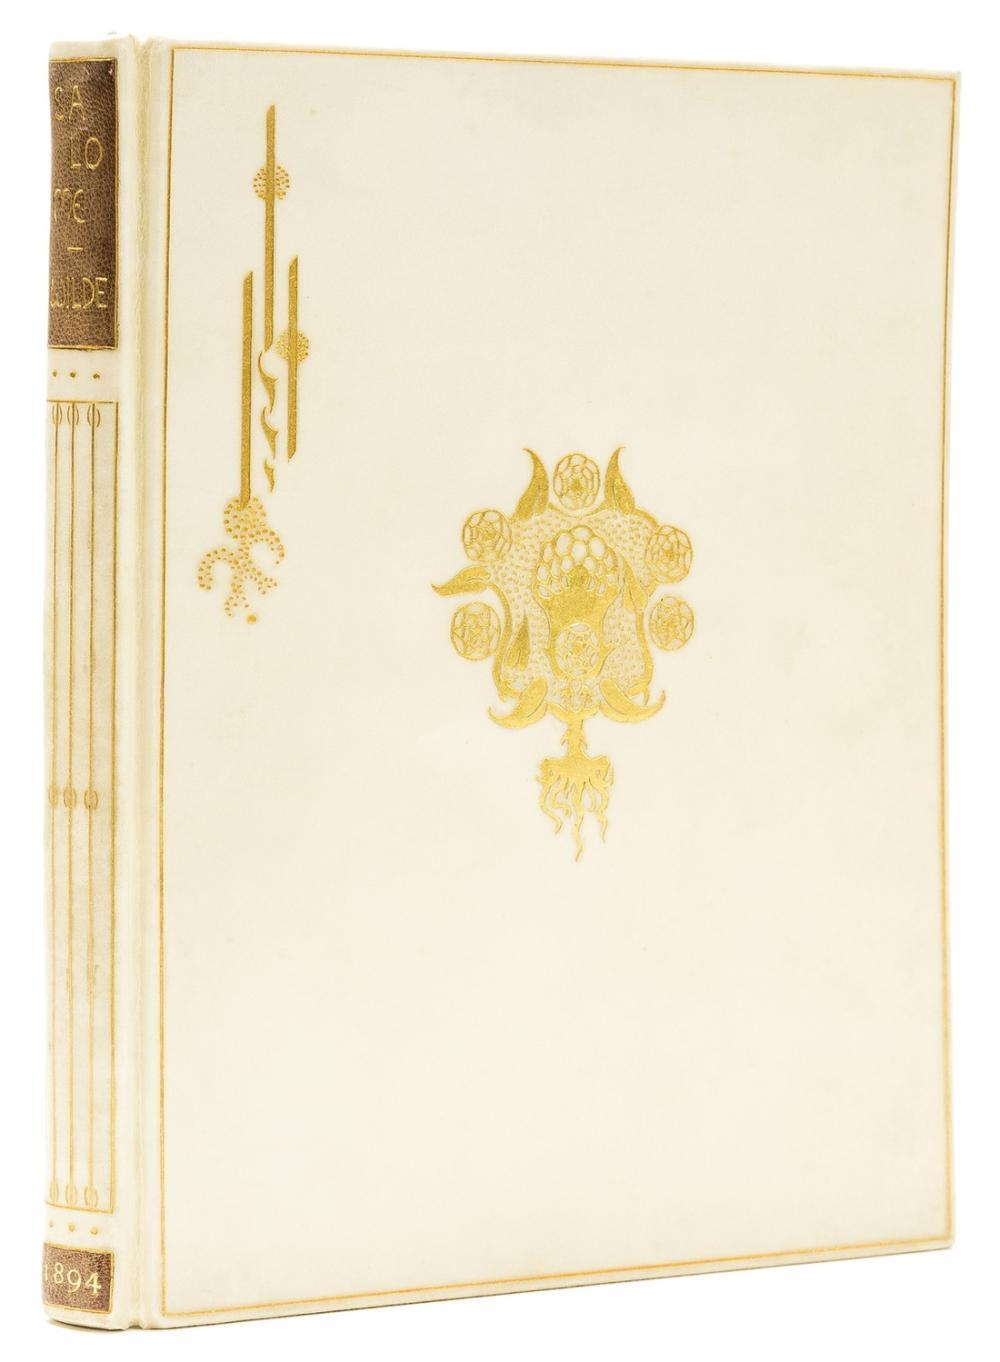 Beardsley (Aubrey).- Wilde (Oscar) Salome, one of 100 copies on Japanese vellum, with the 3 suppressed plates, bound in vellum, gilt, 1894.